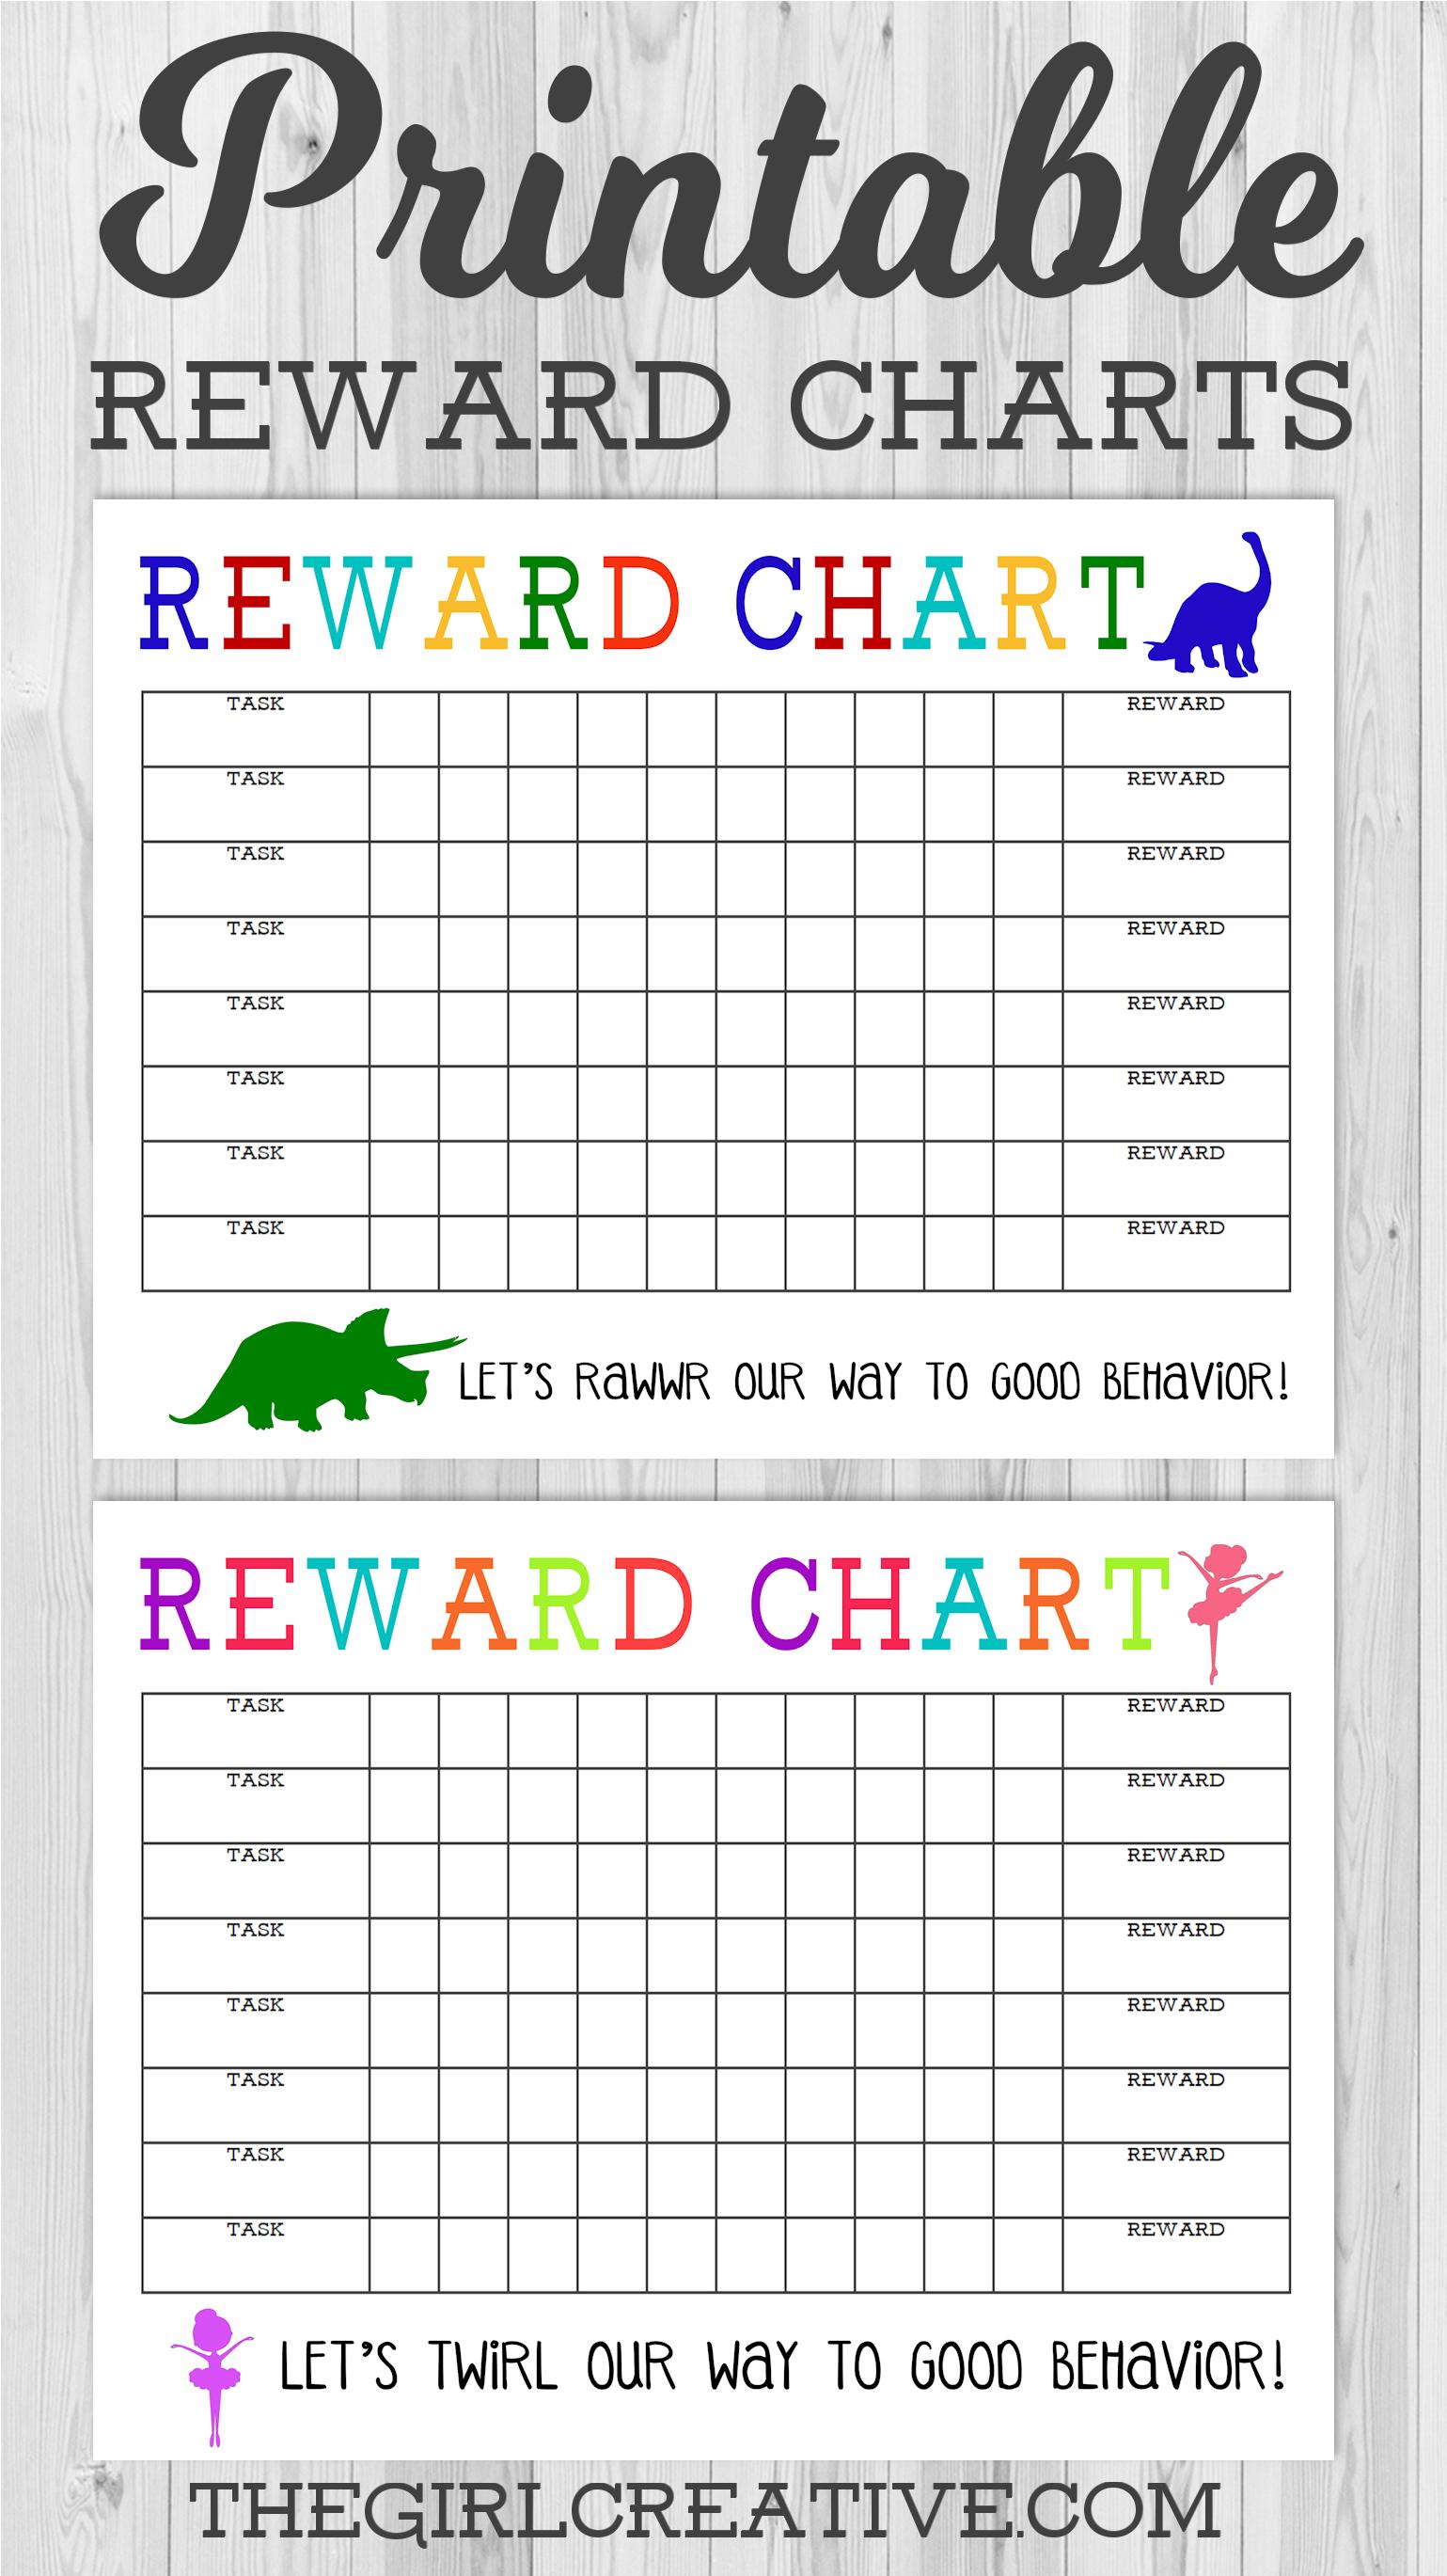 Printable Reward Chart - The Girl Creative - Charts Free Printable